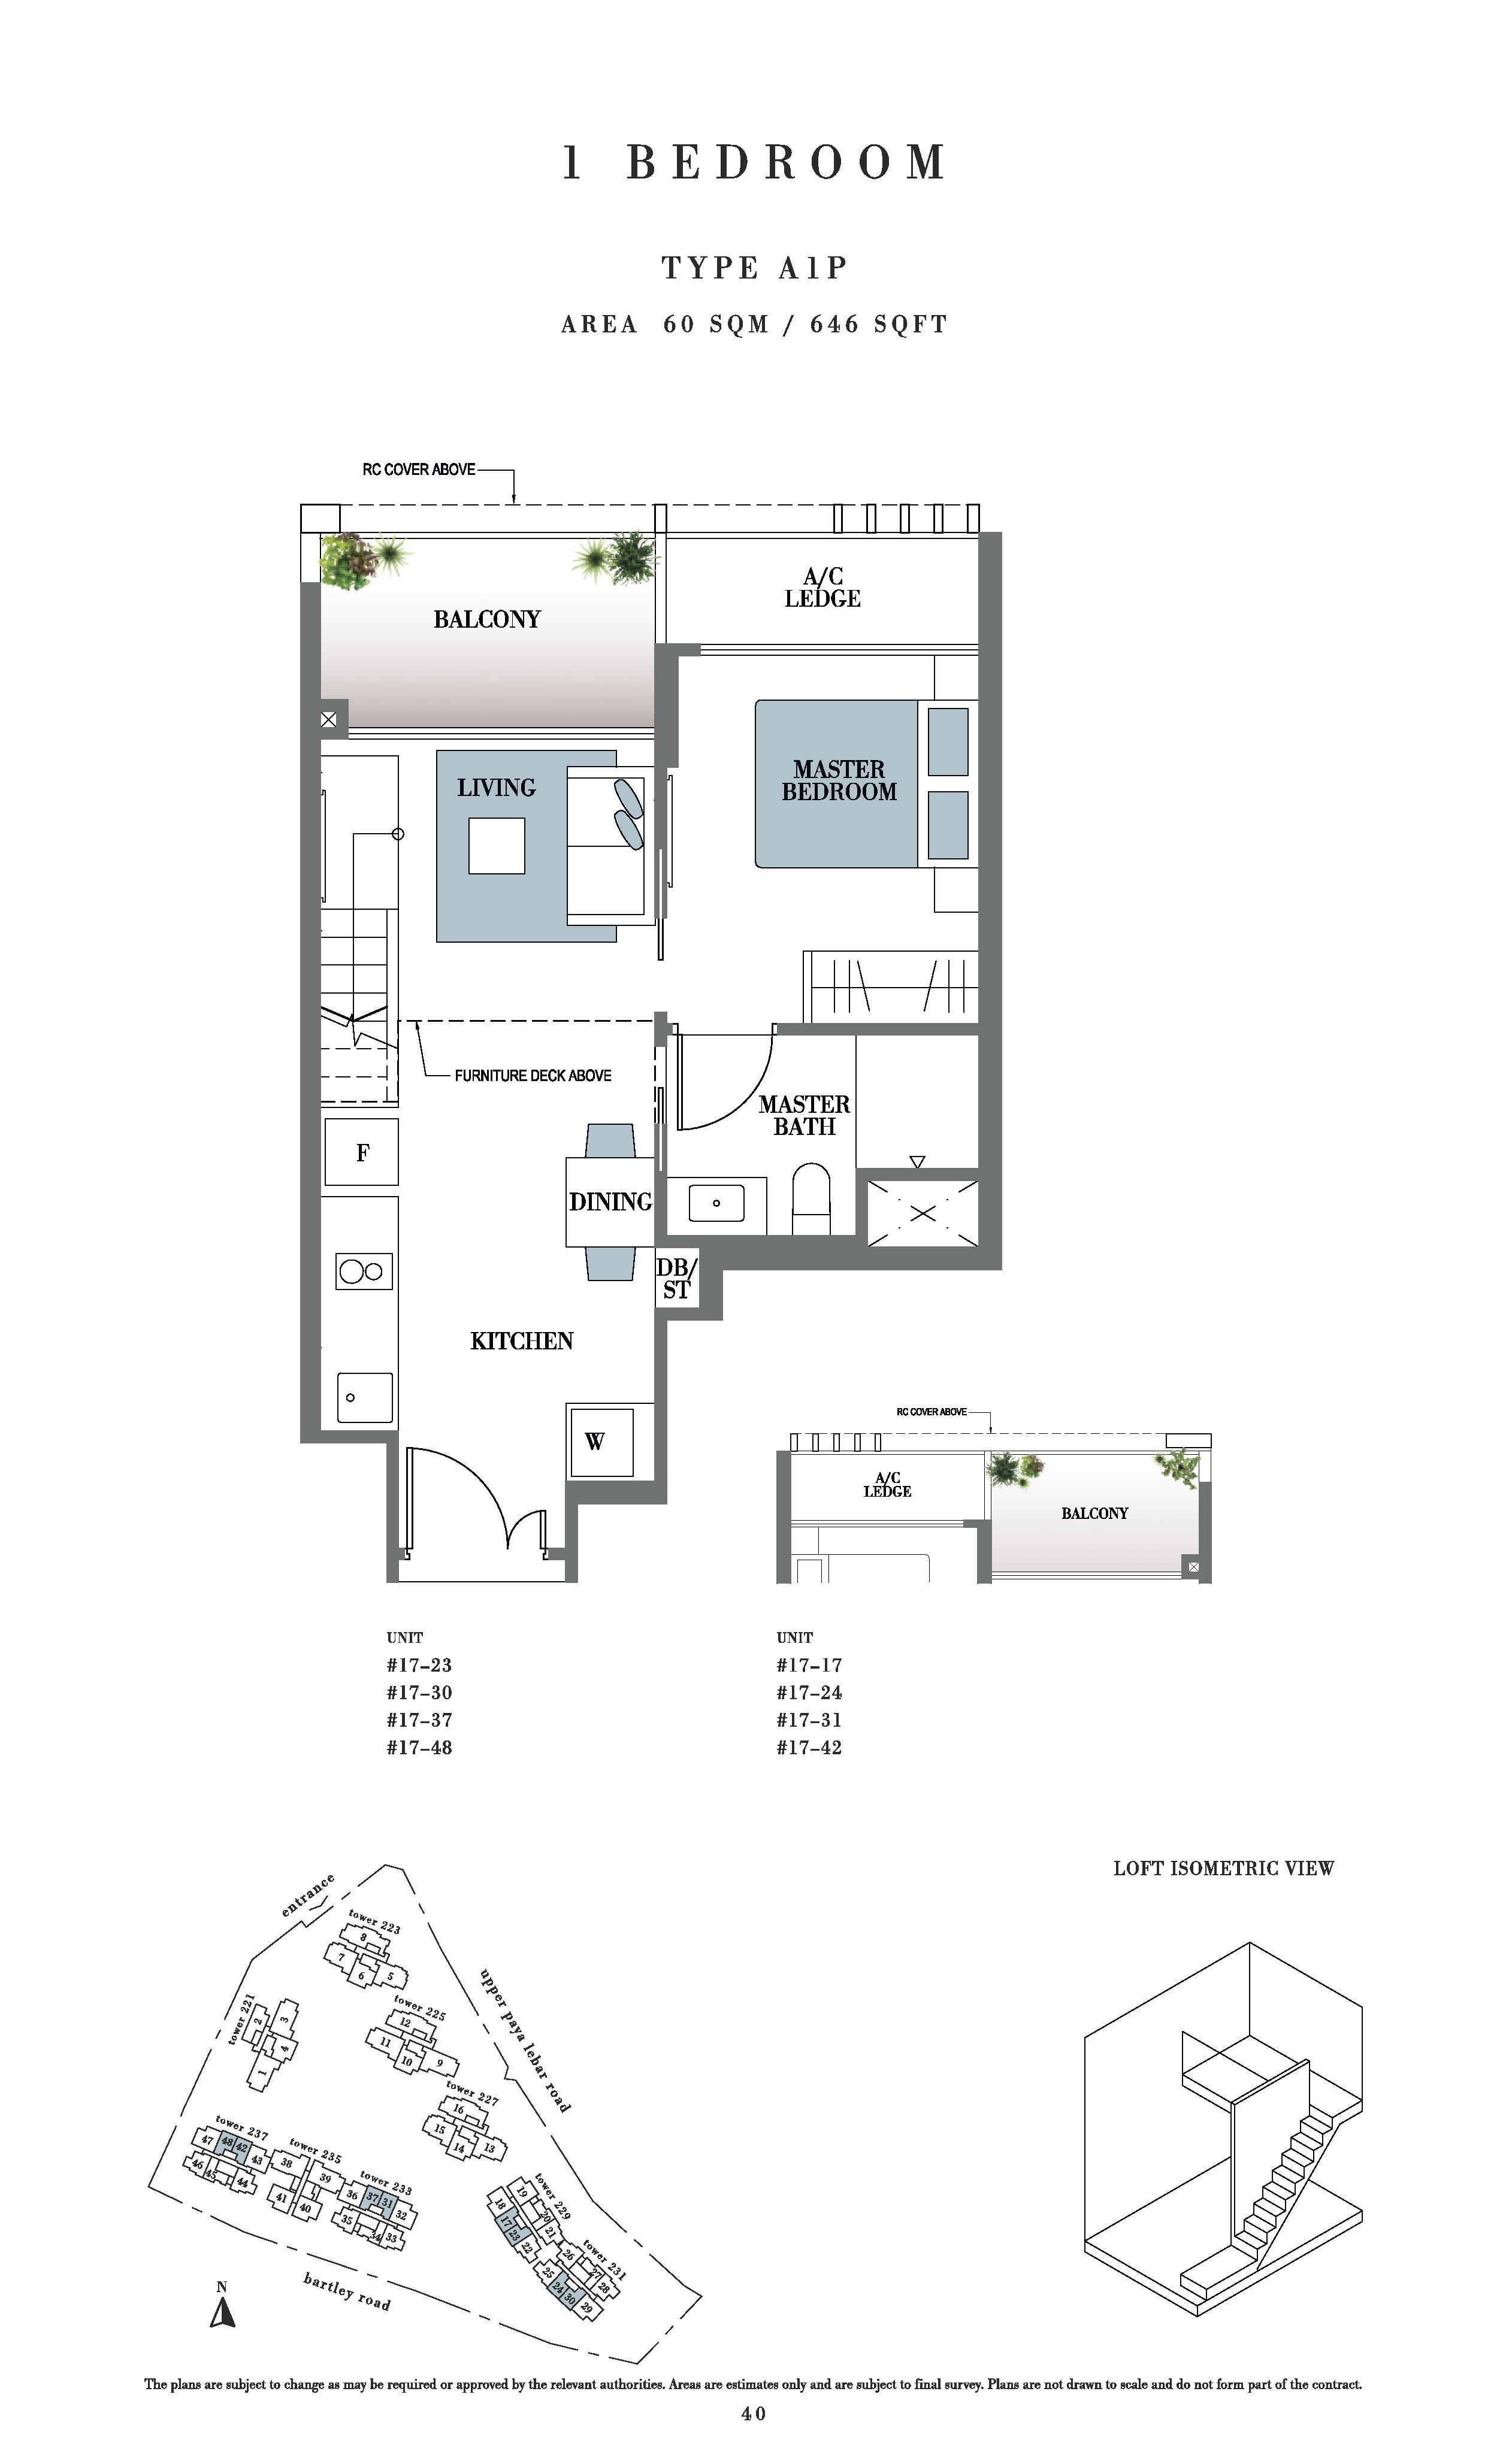 Botanique @ bartley 1 Bedroom Floor Plans Type A1P